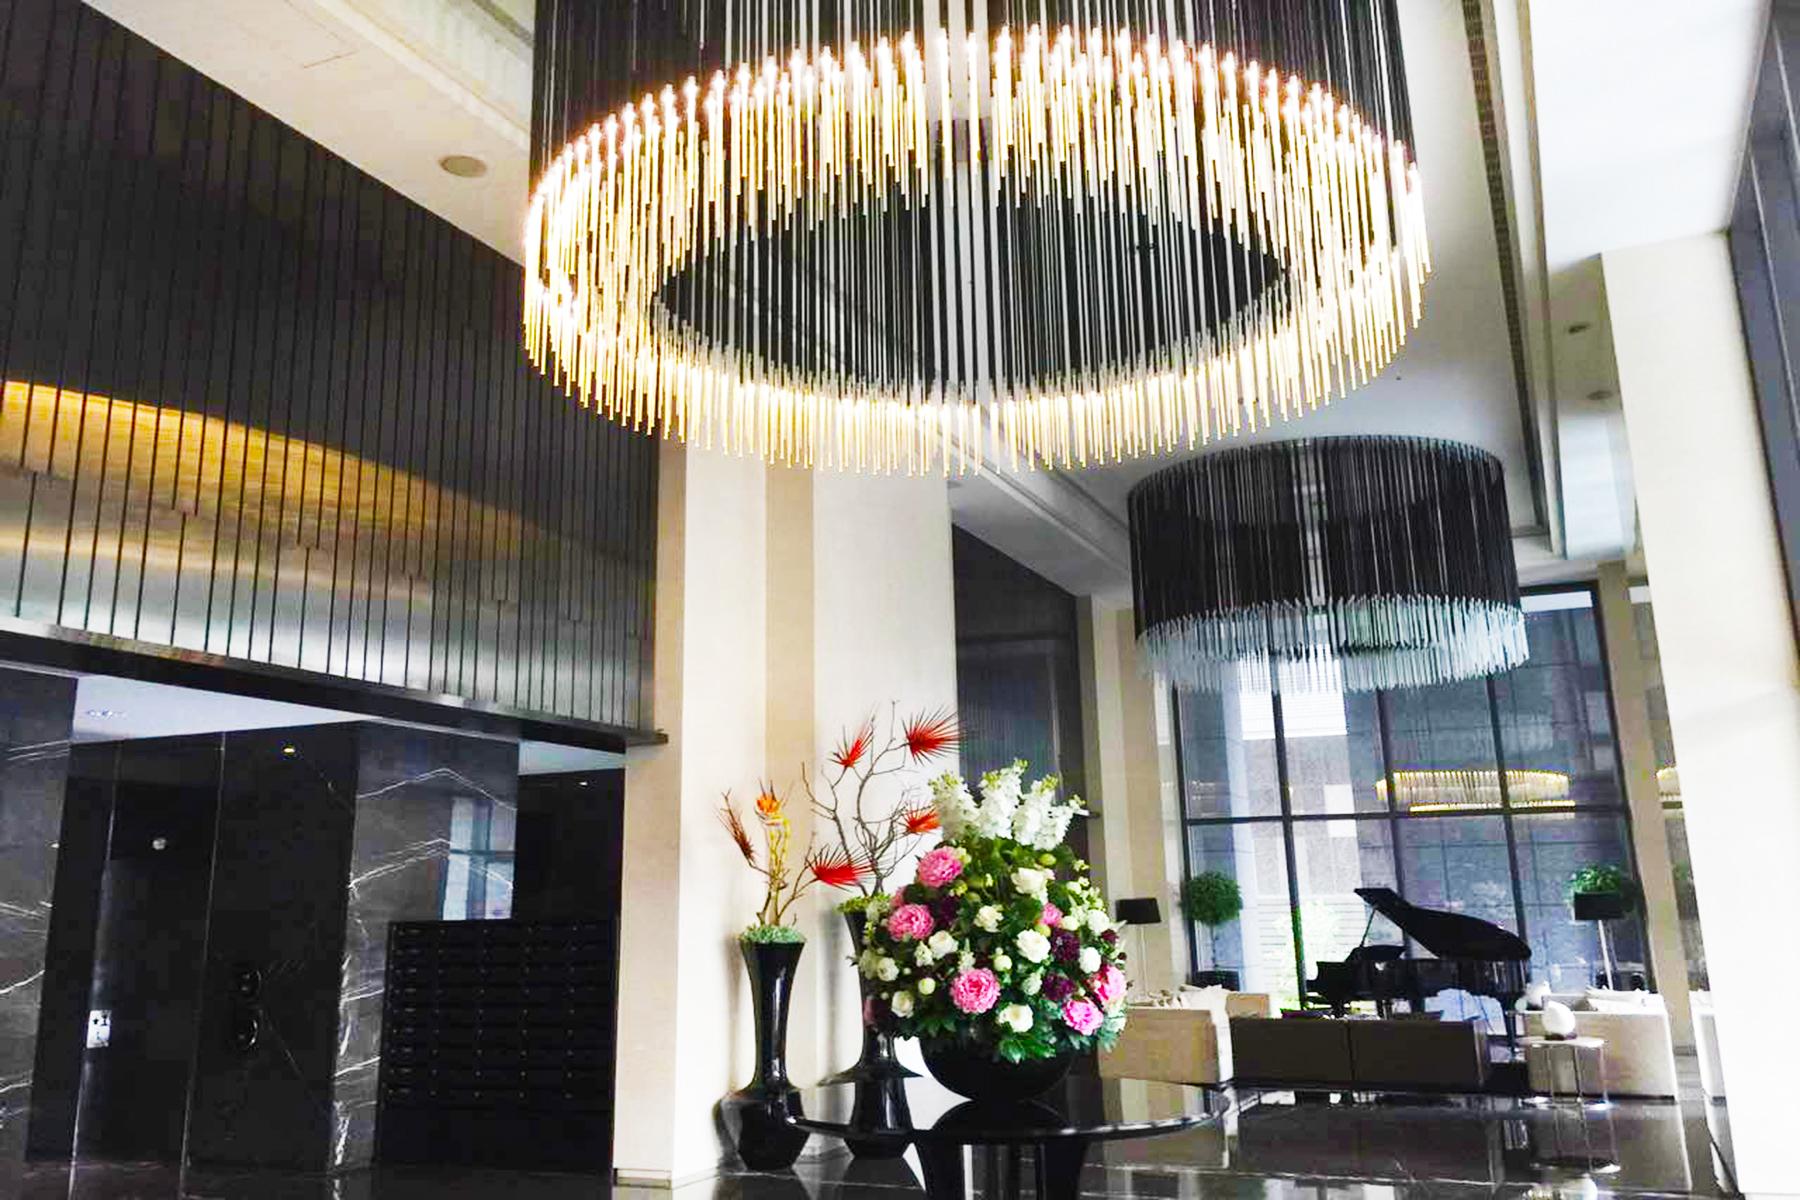 Property For Sale at Shizheng N. 1st Rd., Xitun Dist.